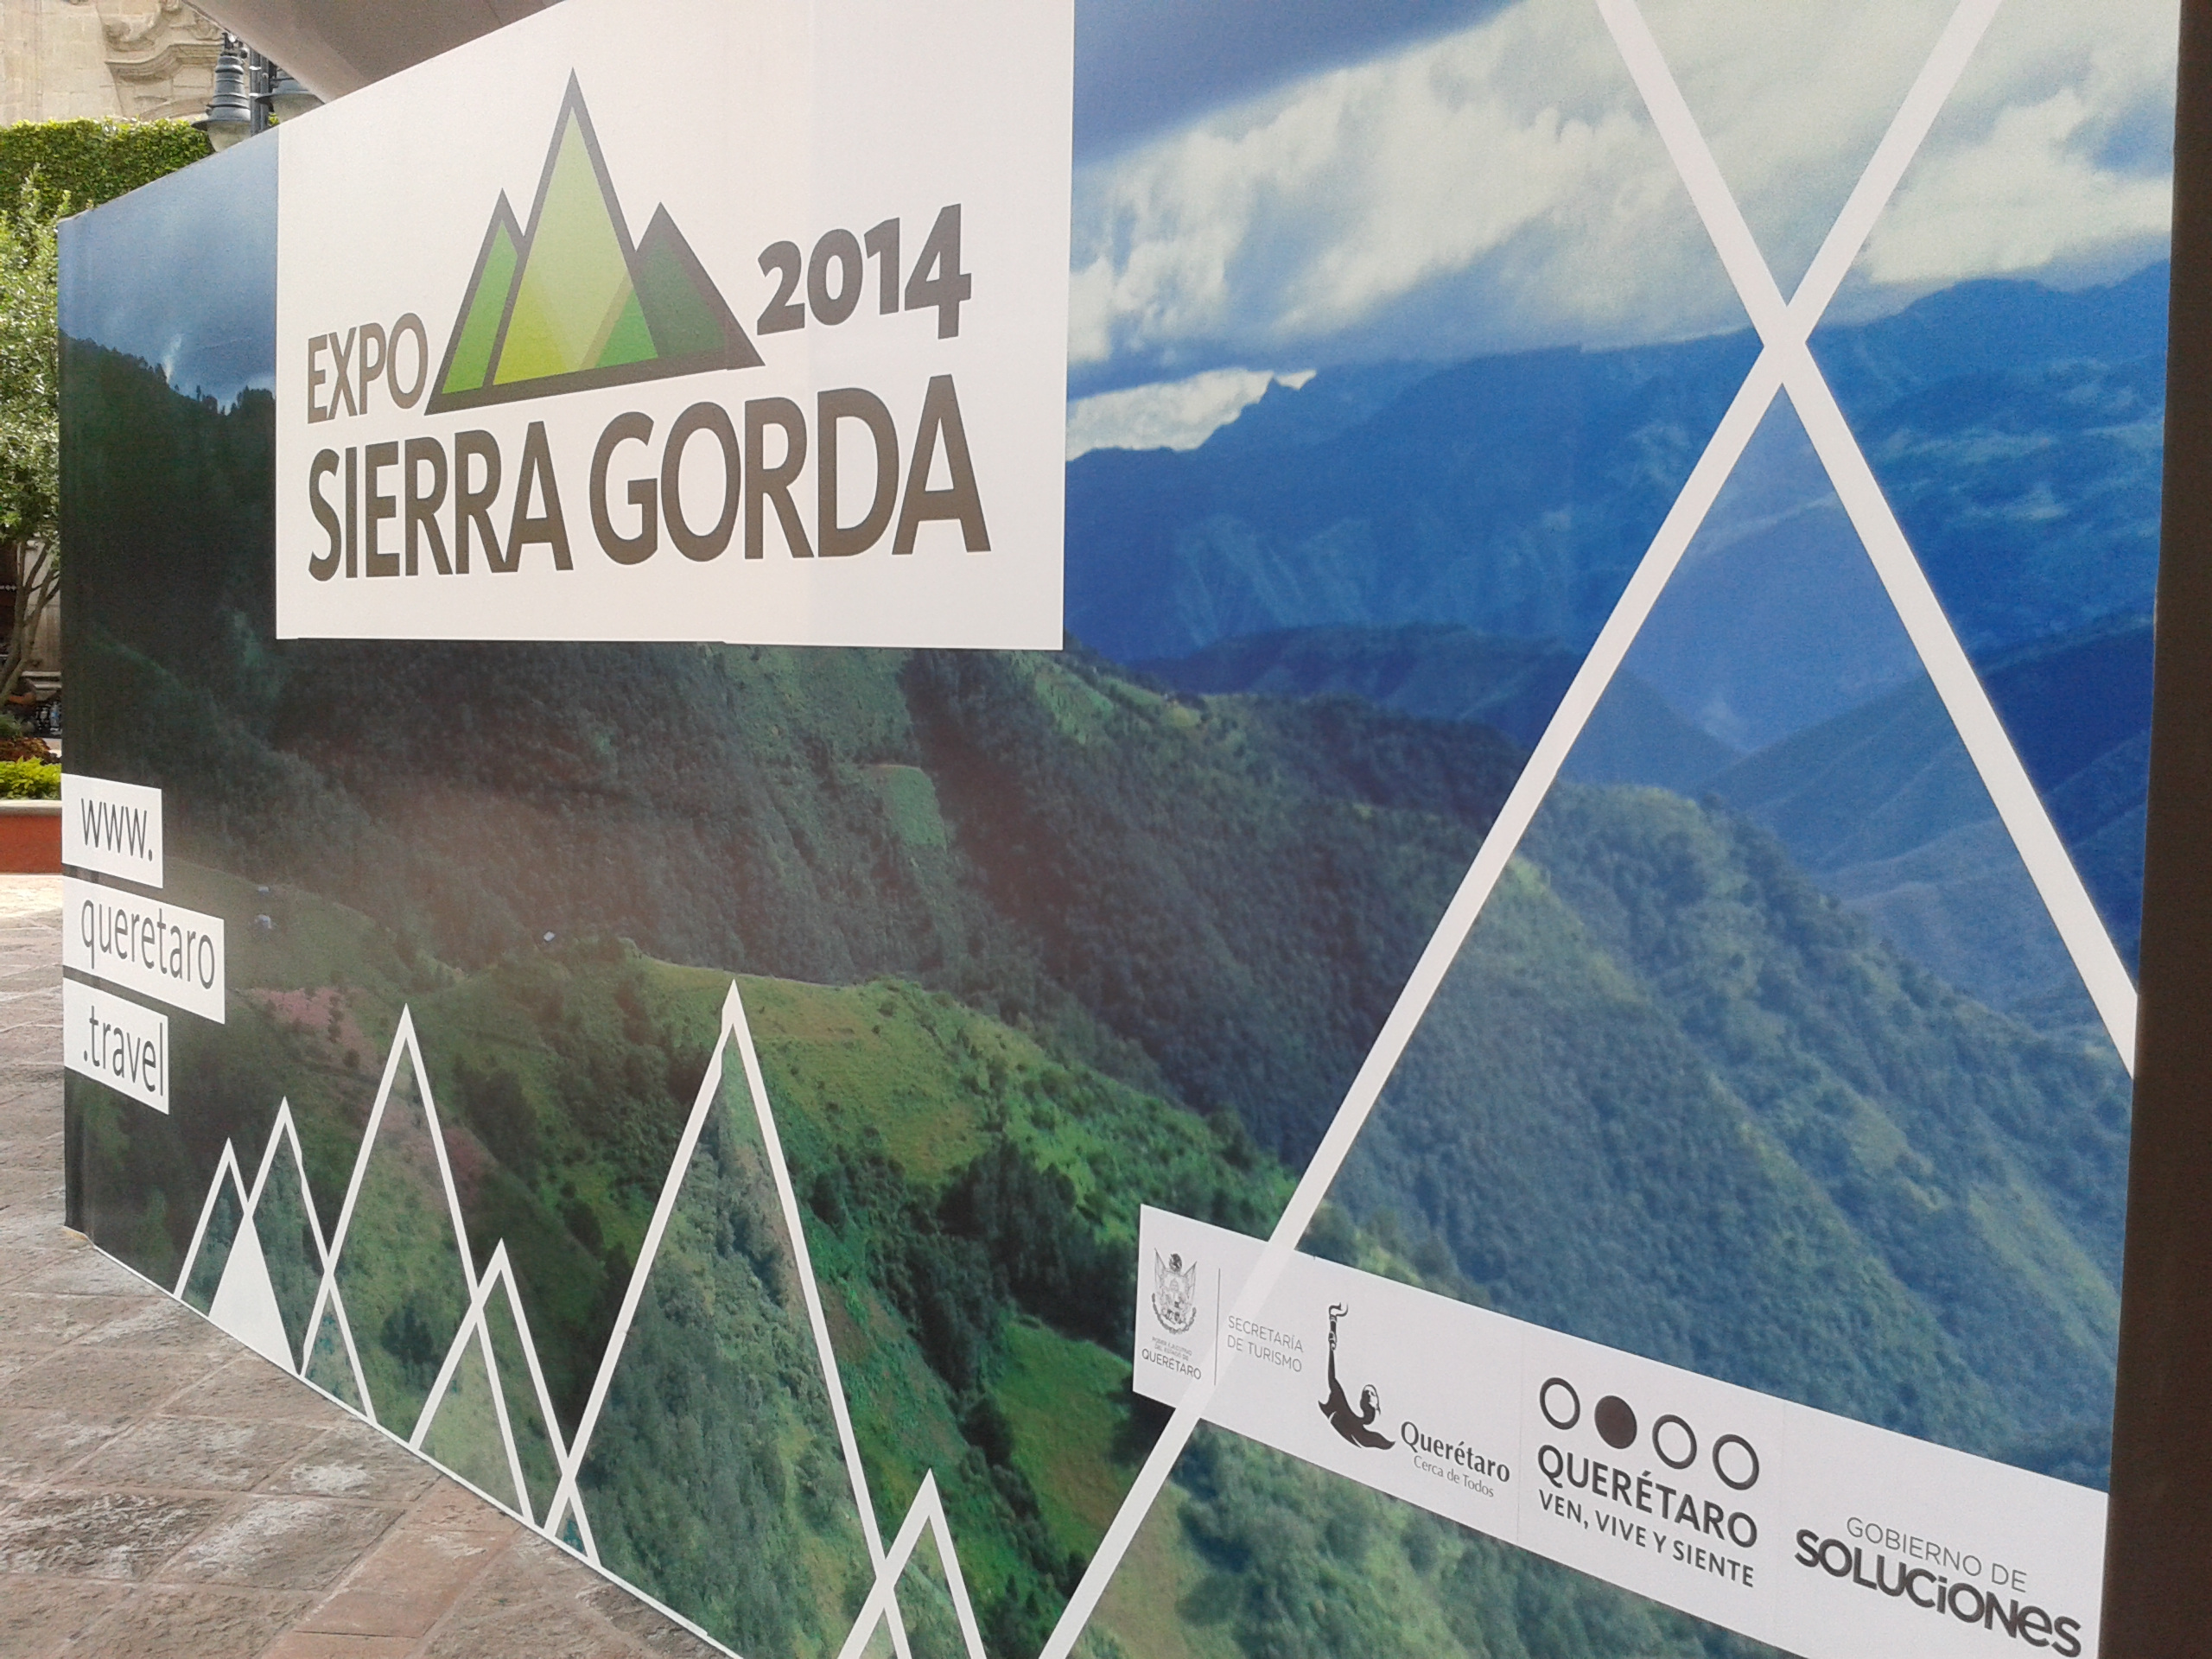 Inauguran Expo Sierra Gorda 2014